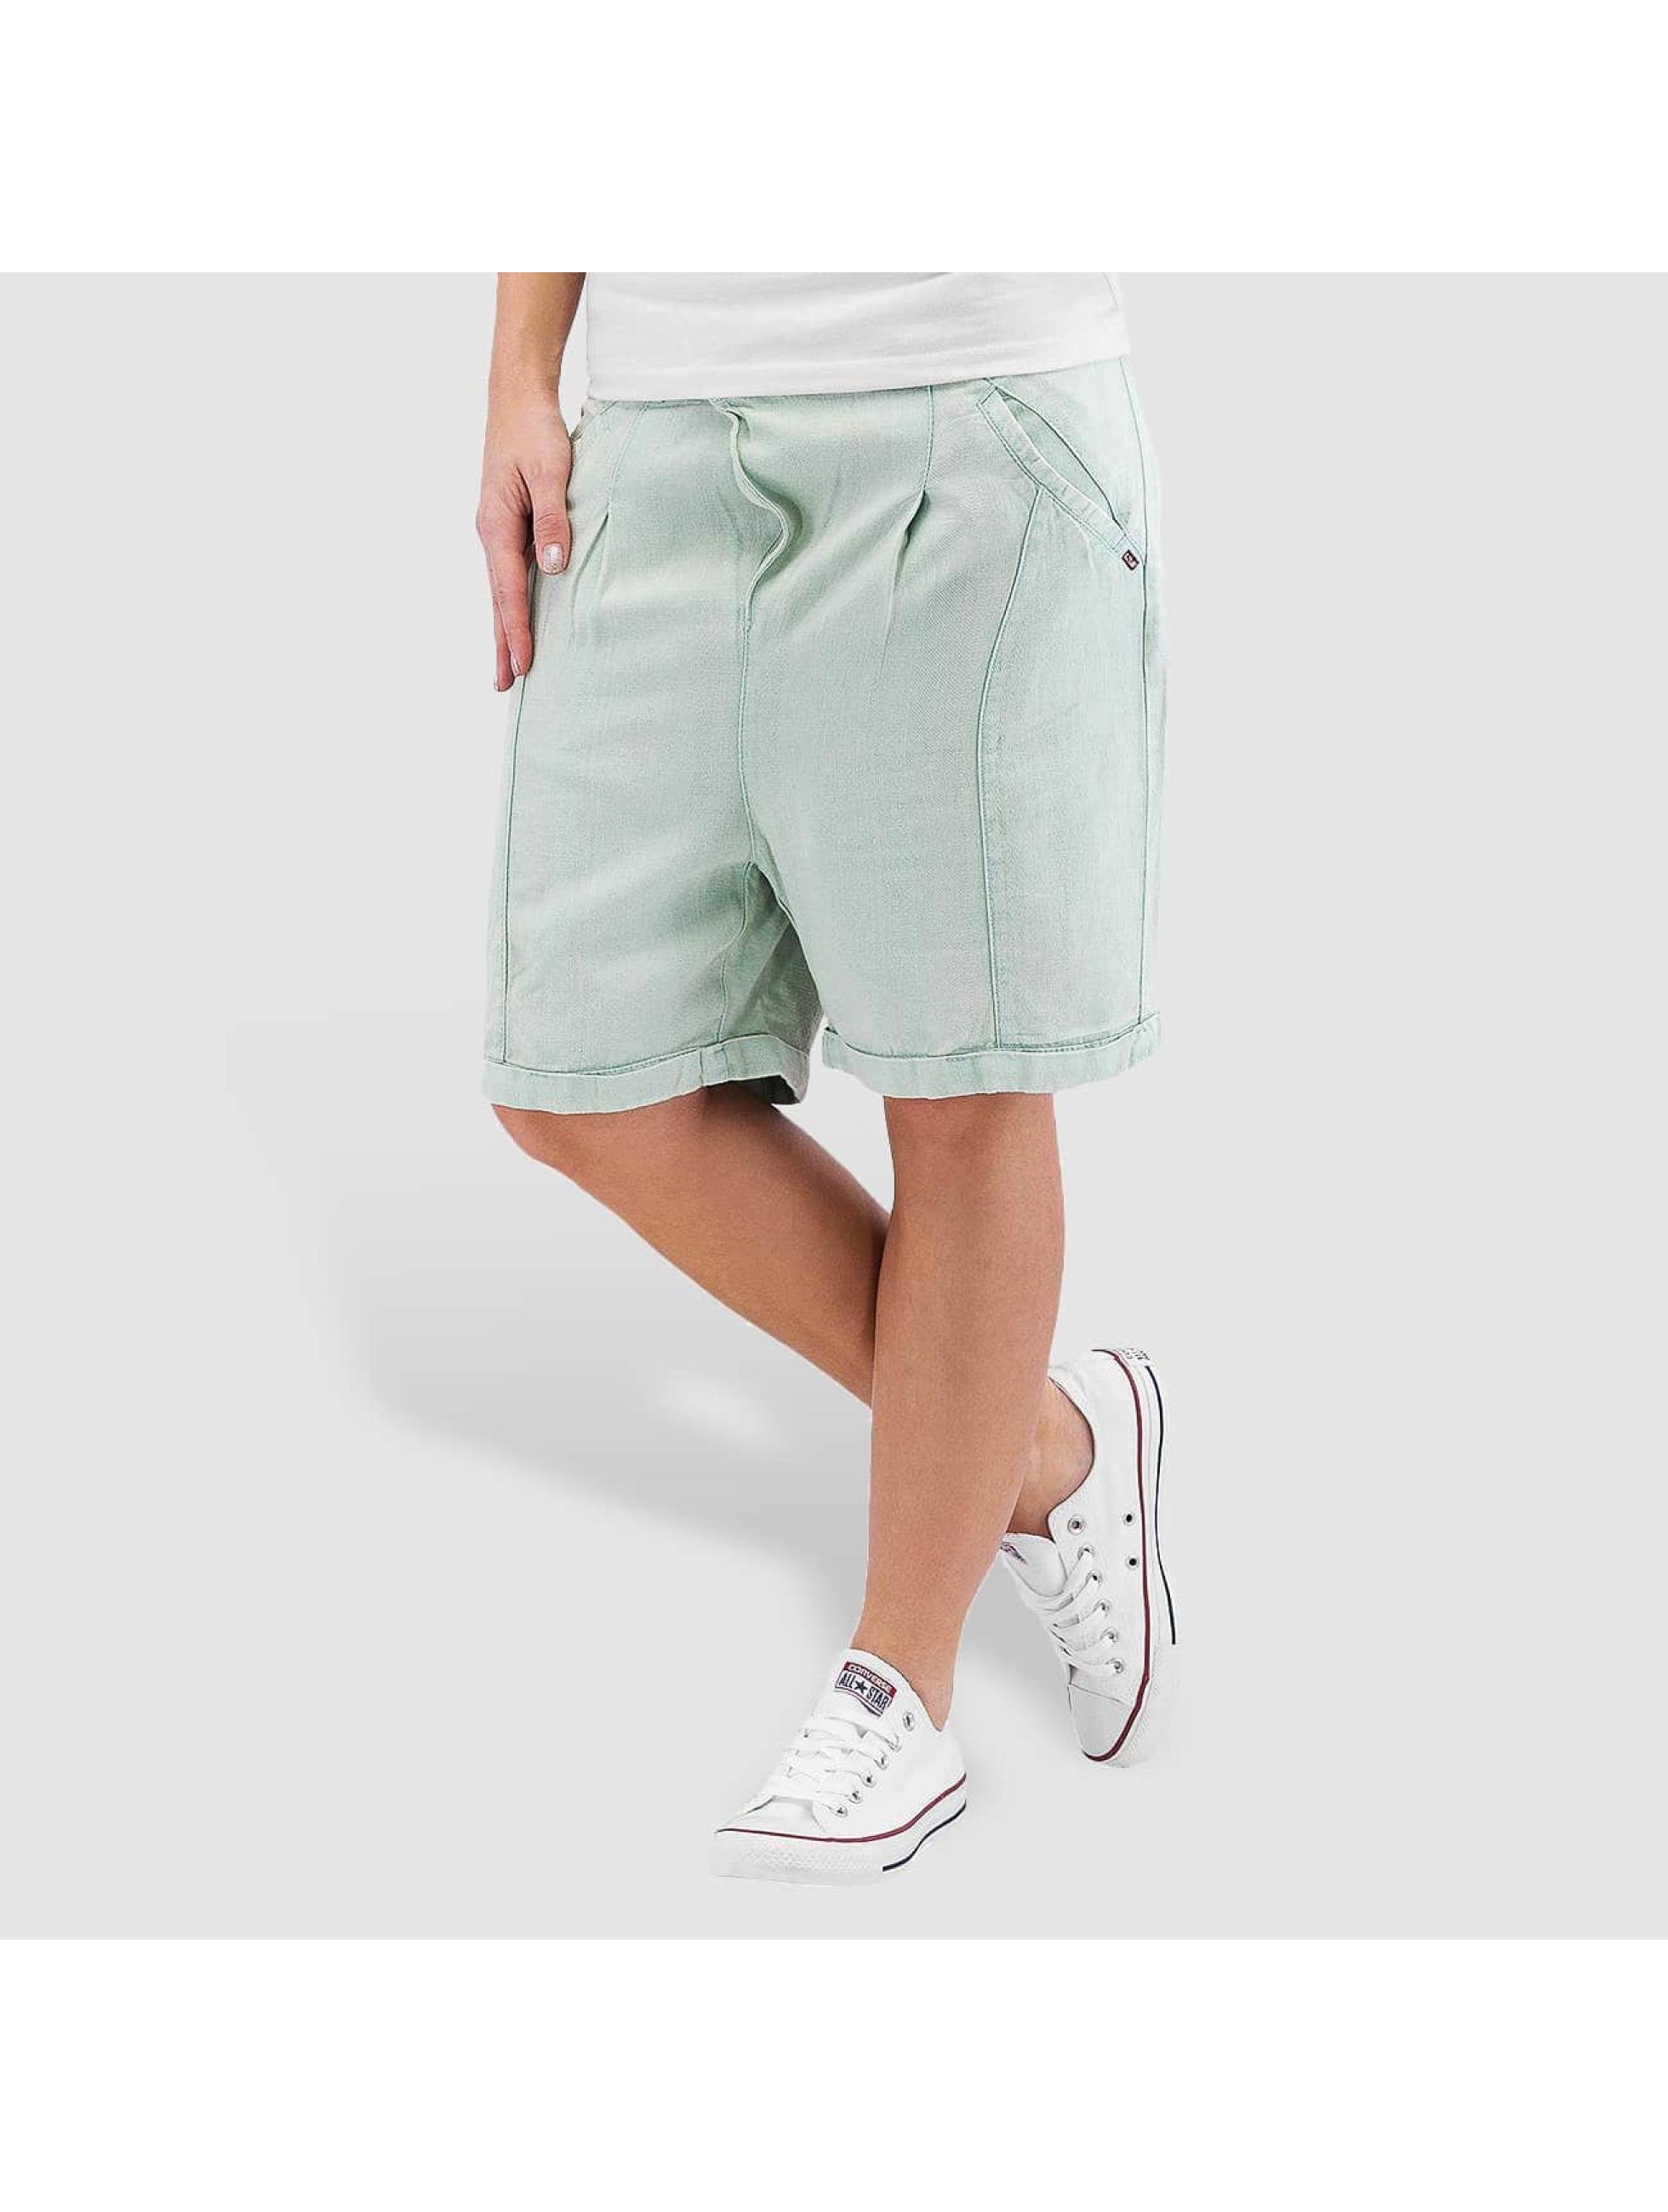 Khujo shorts Mackay turquois